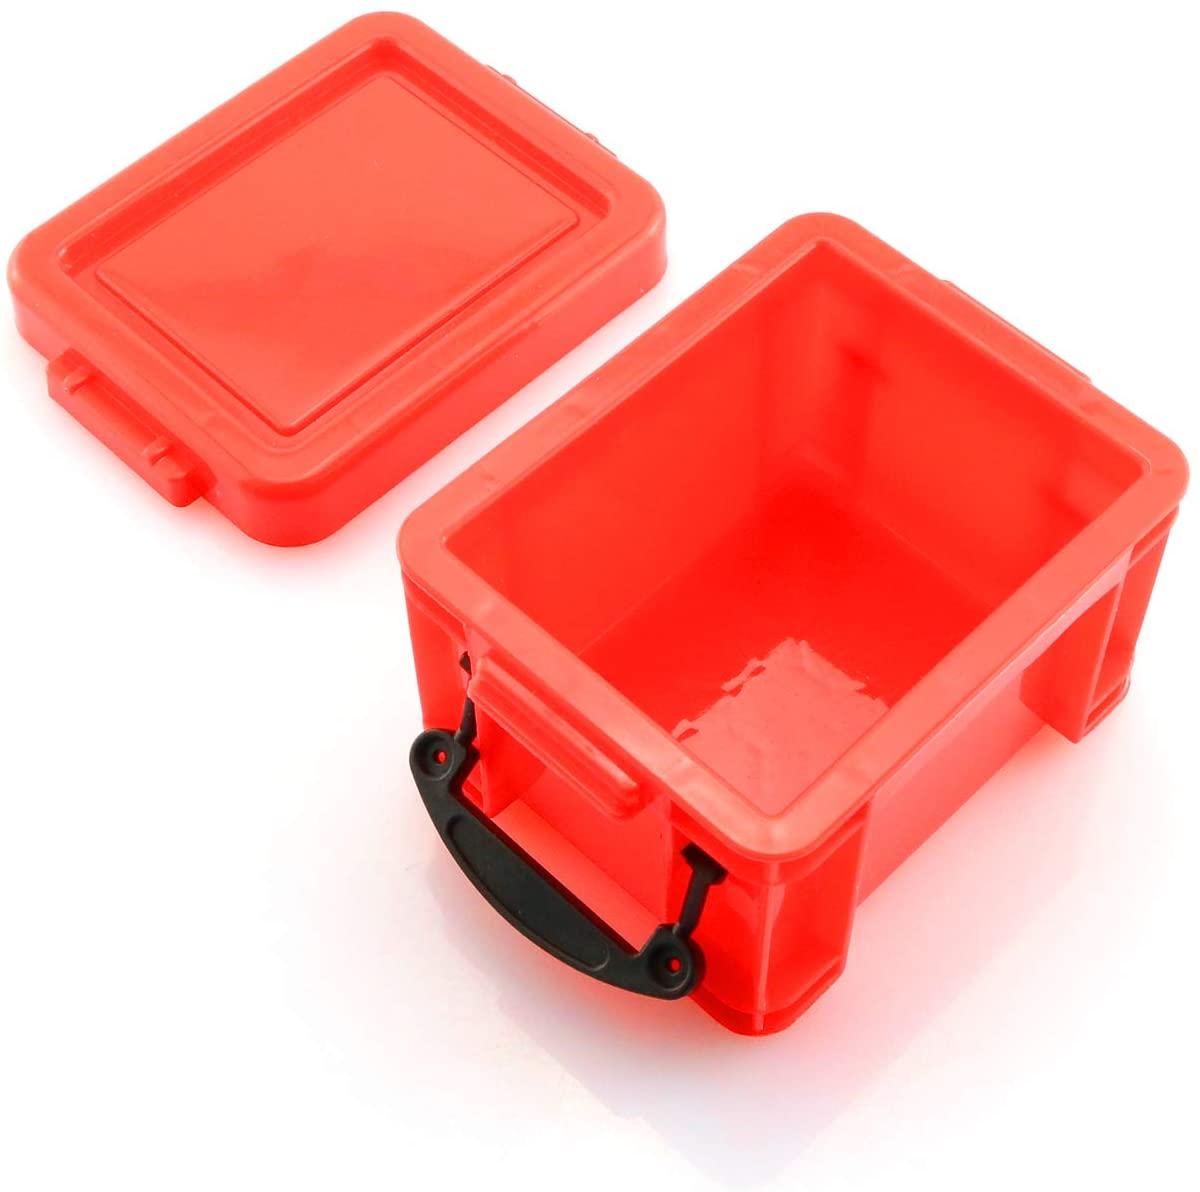 Maxmoral Mini Decoration Plastic Storage Box Accessories for 1/10 RC Rock Crawler TRX4 Axial SCX10 RC Car Truck Parts Red